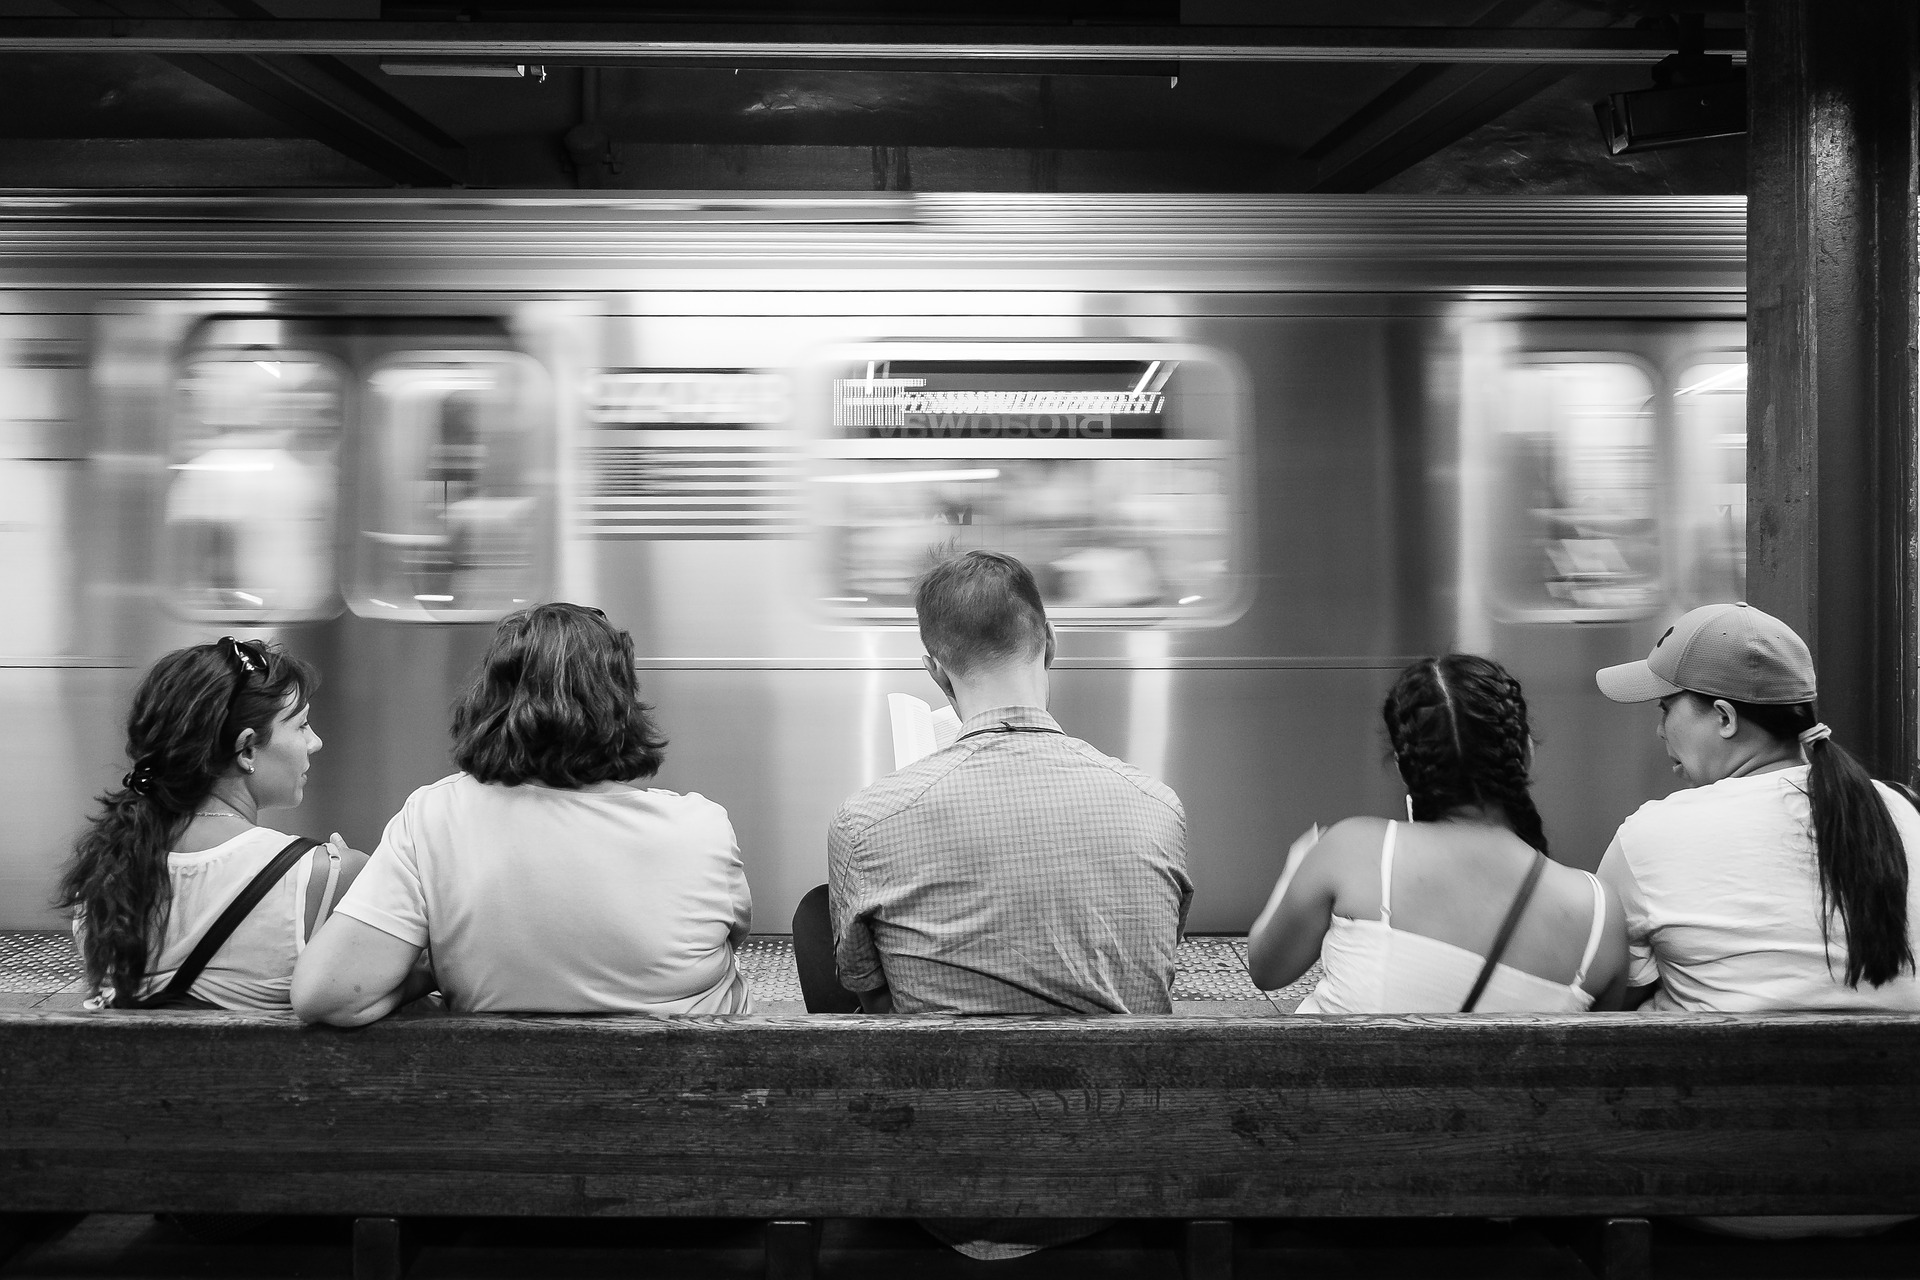 subway-1681222_1920